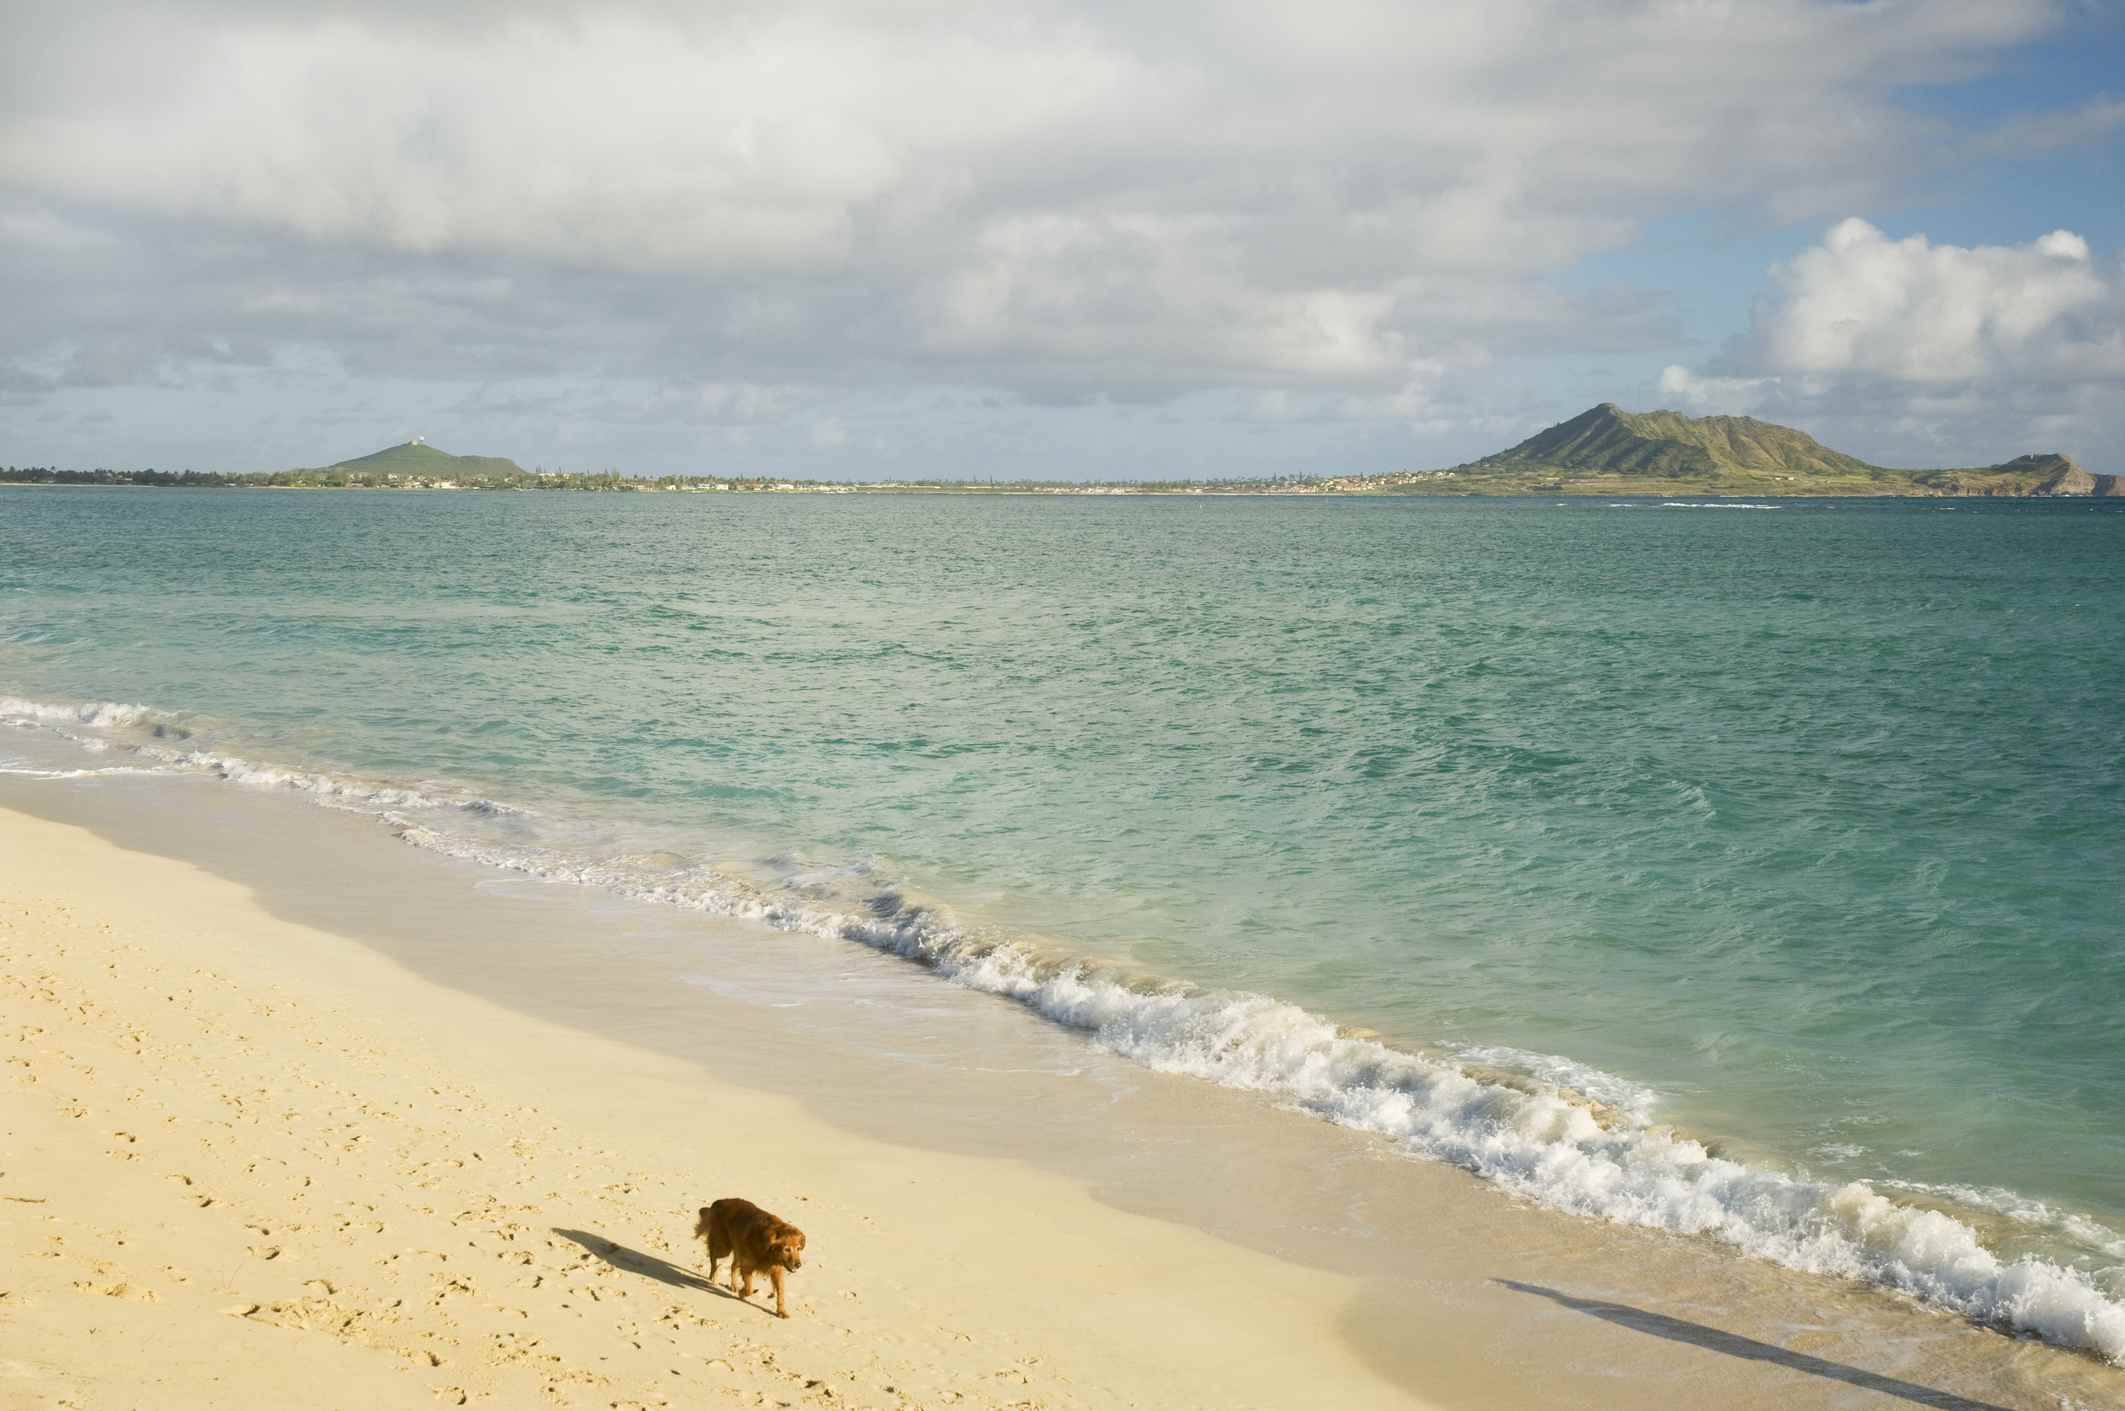 Kailua Beach in Hawaii.